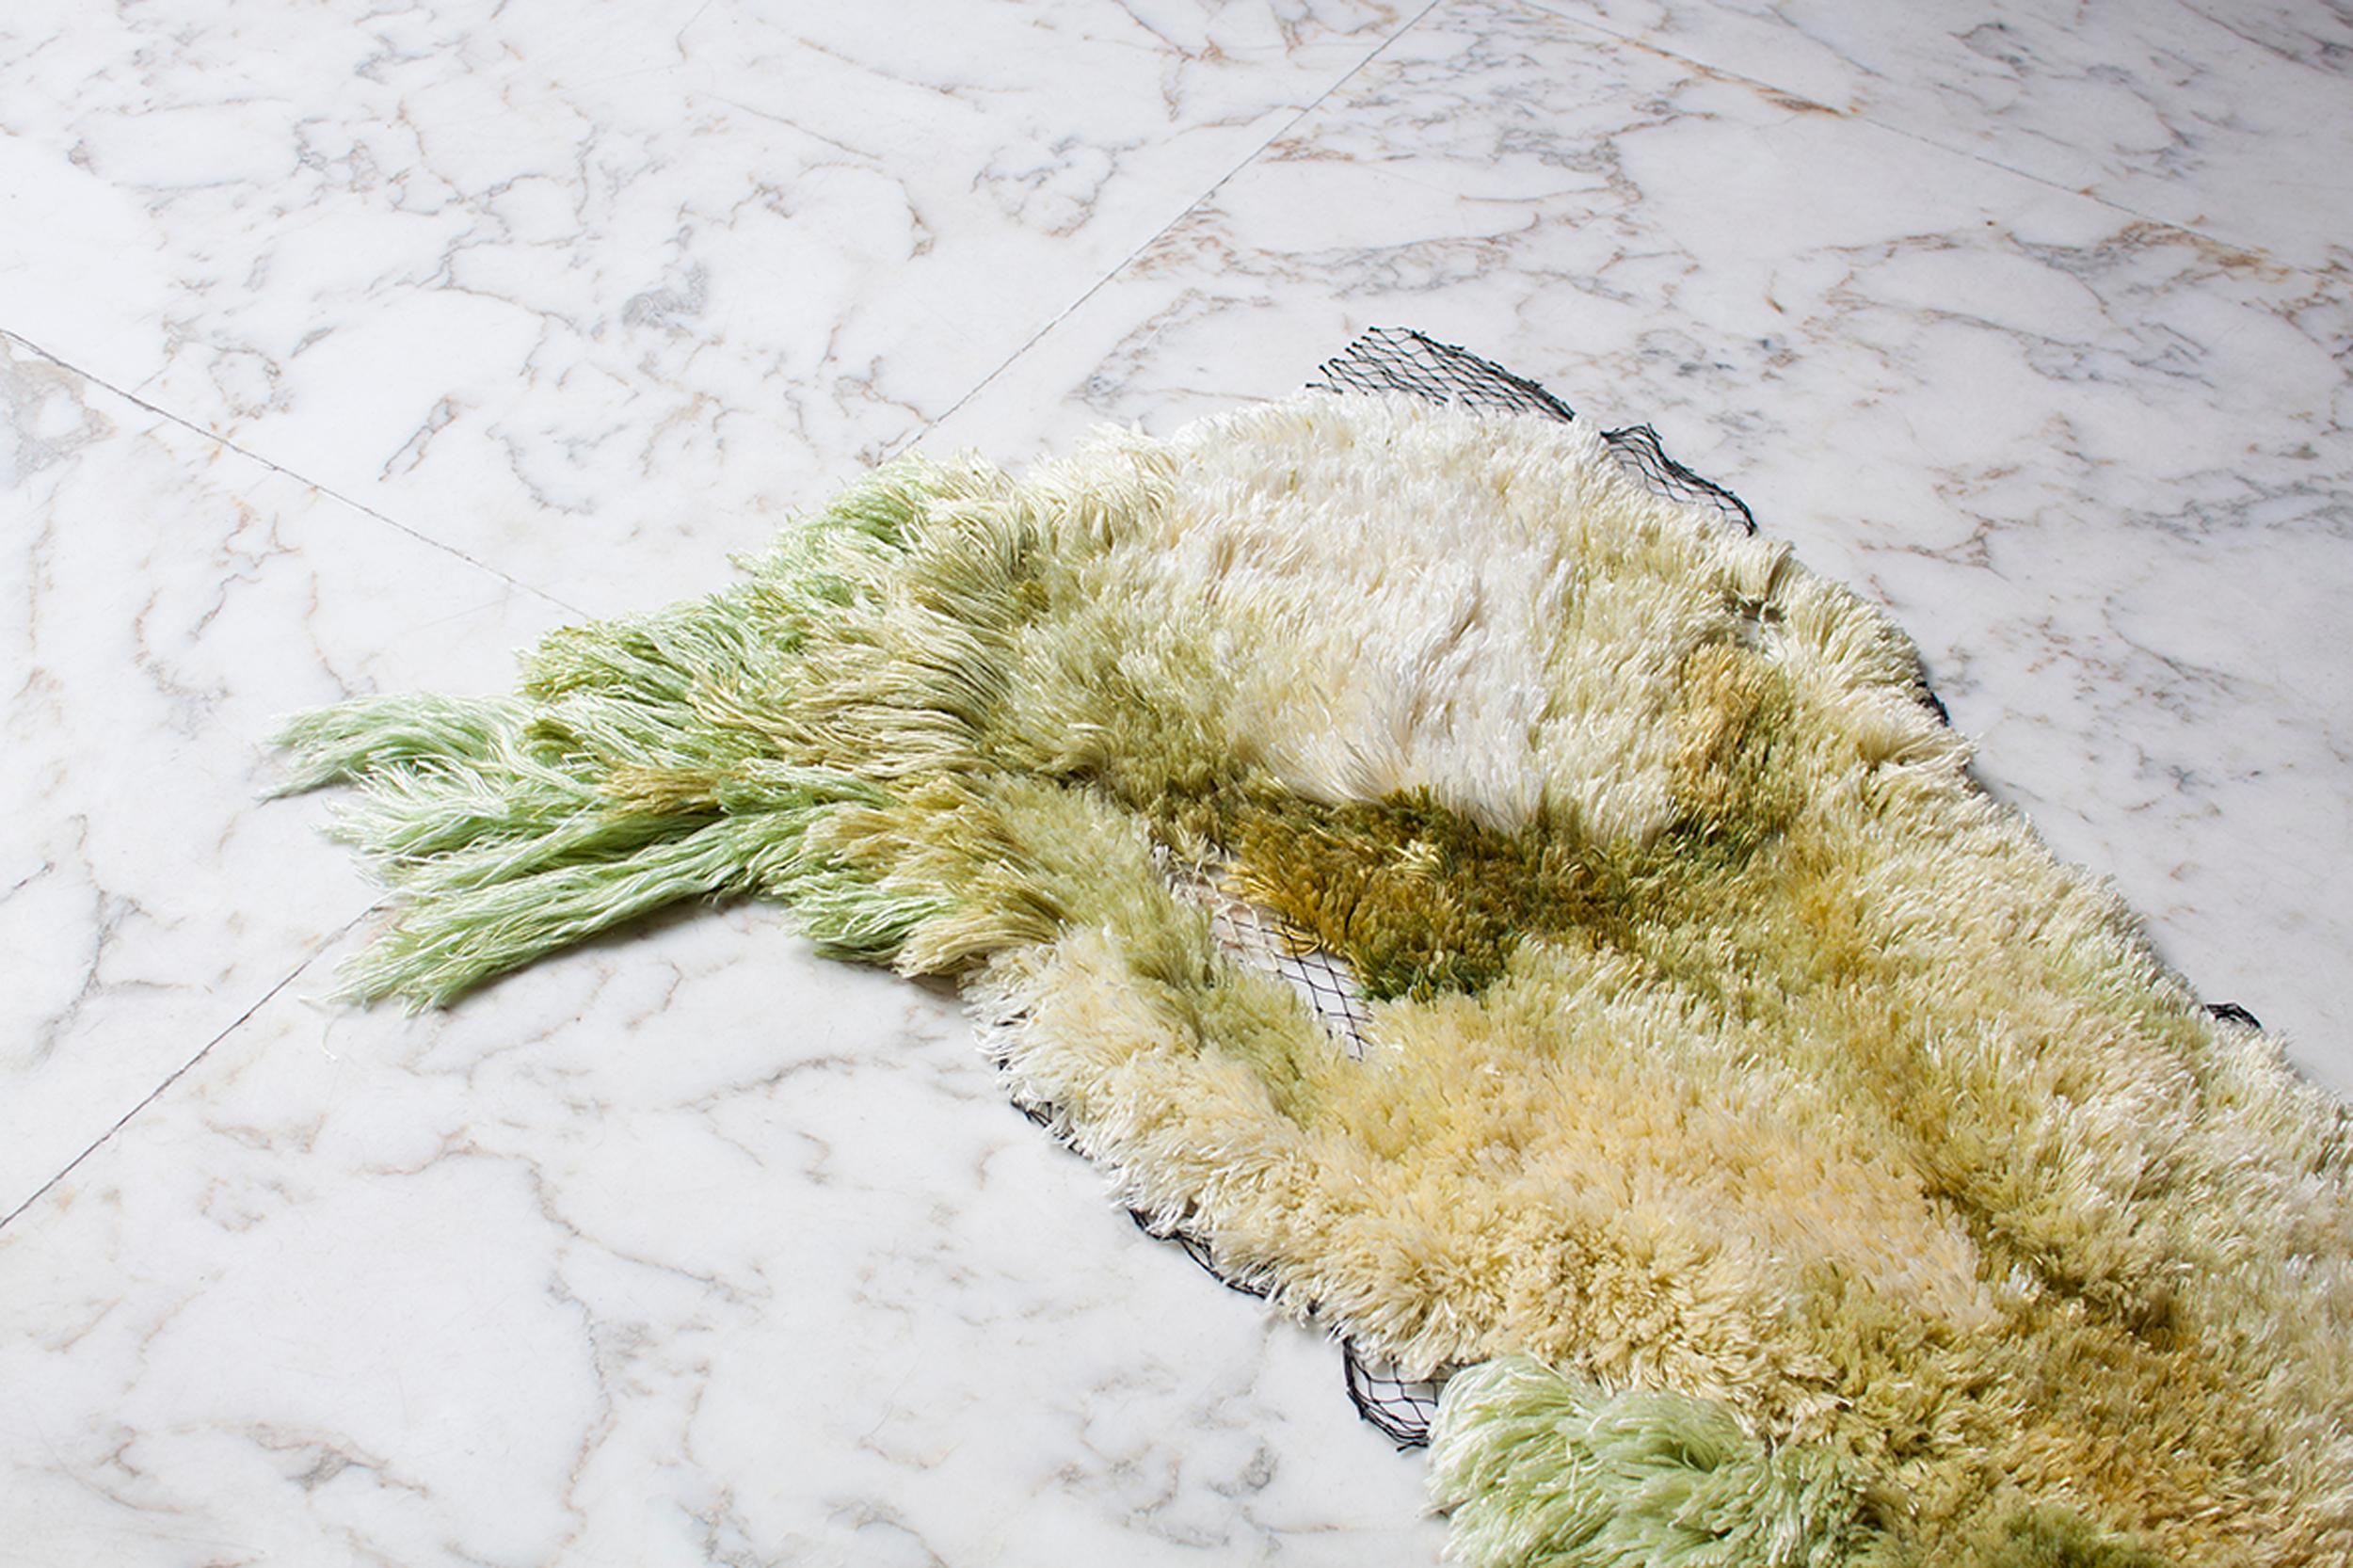 Ma-tt-er - Material Monday: Seaweed